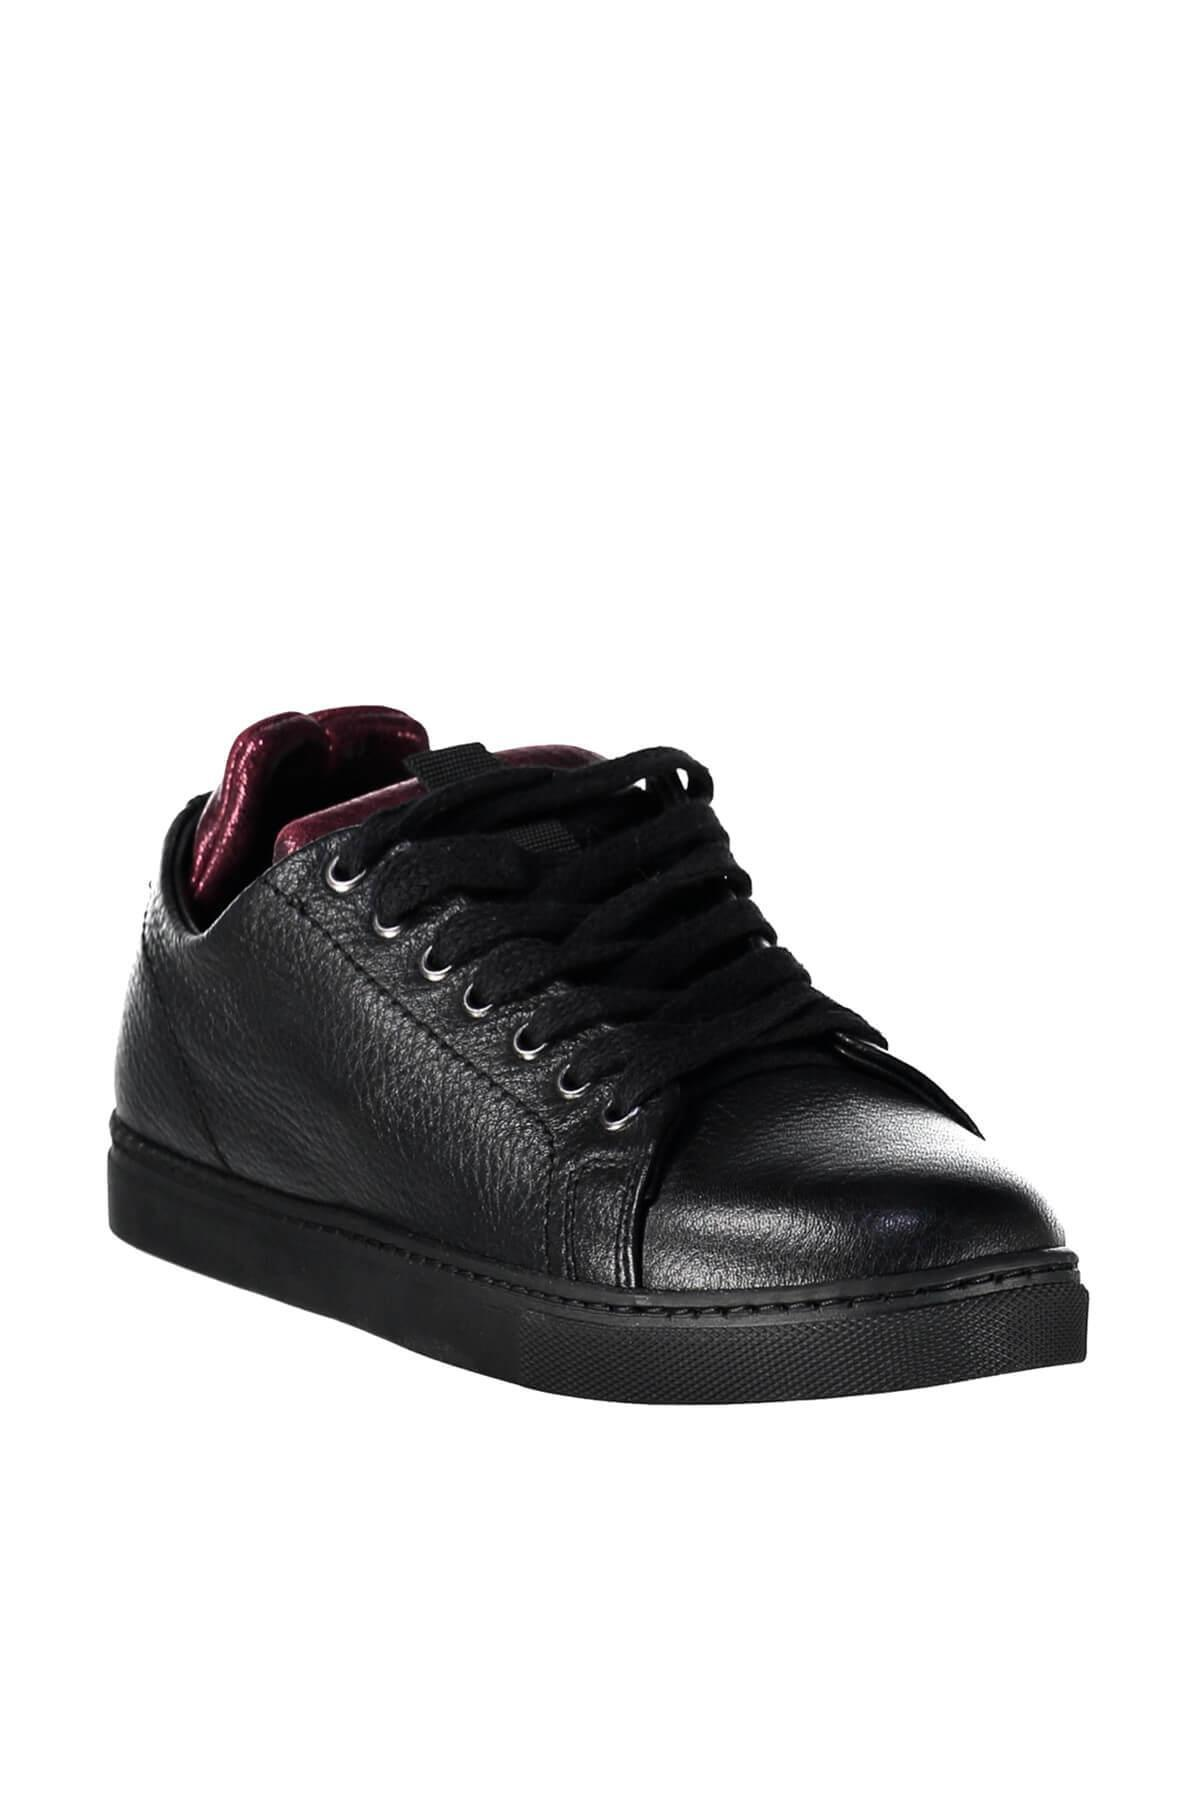 Derimod Sapatos De Mulher Preta De Couro Genuíno